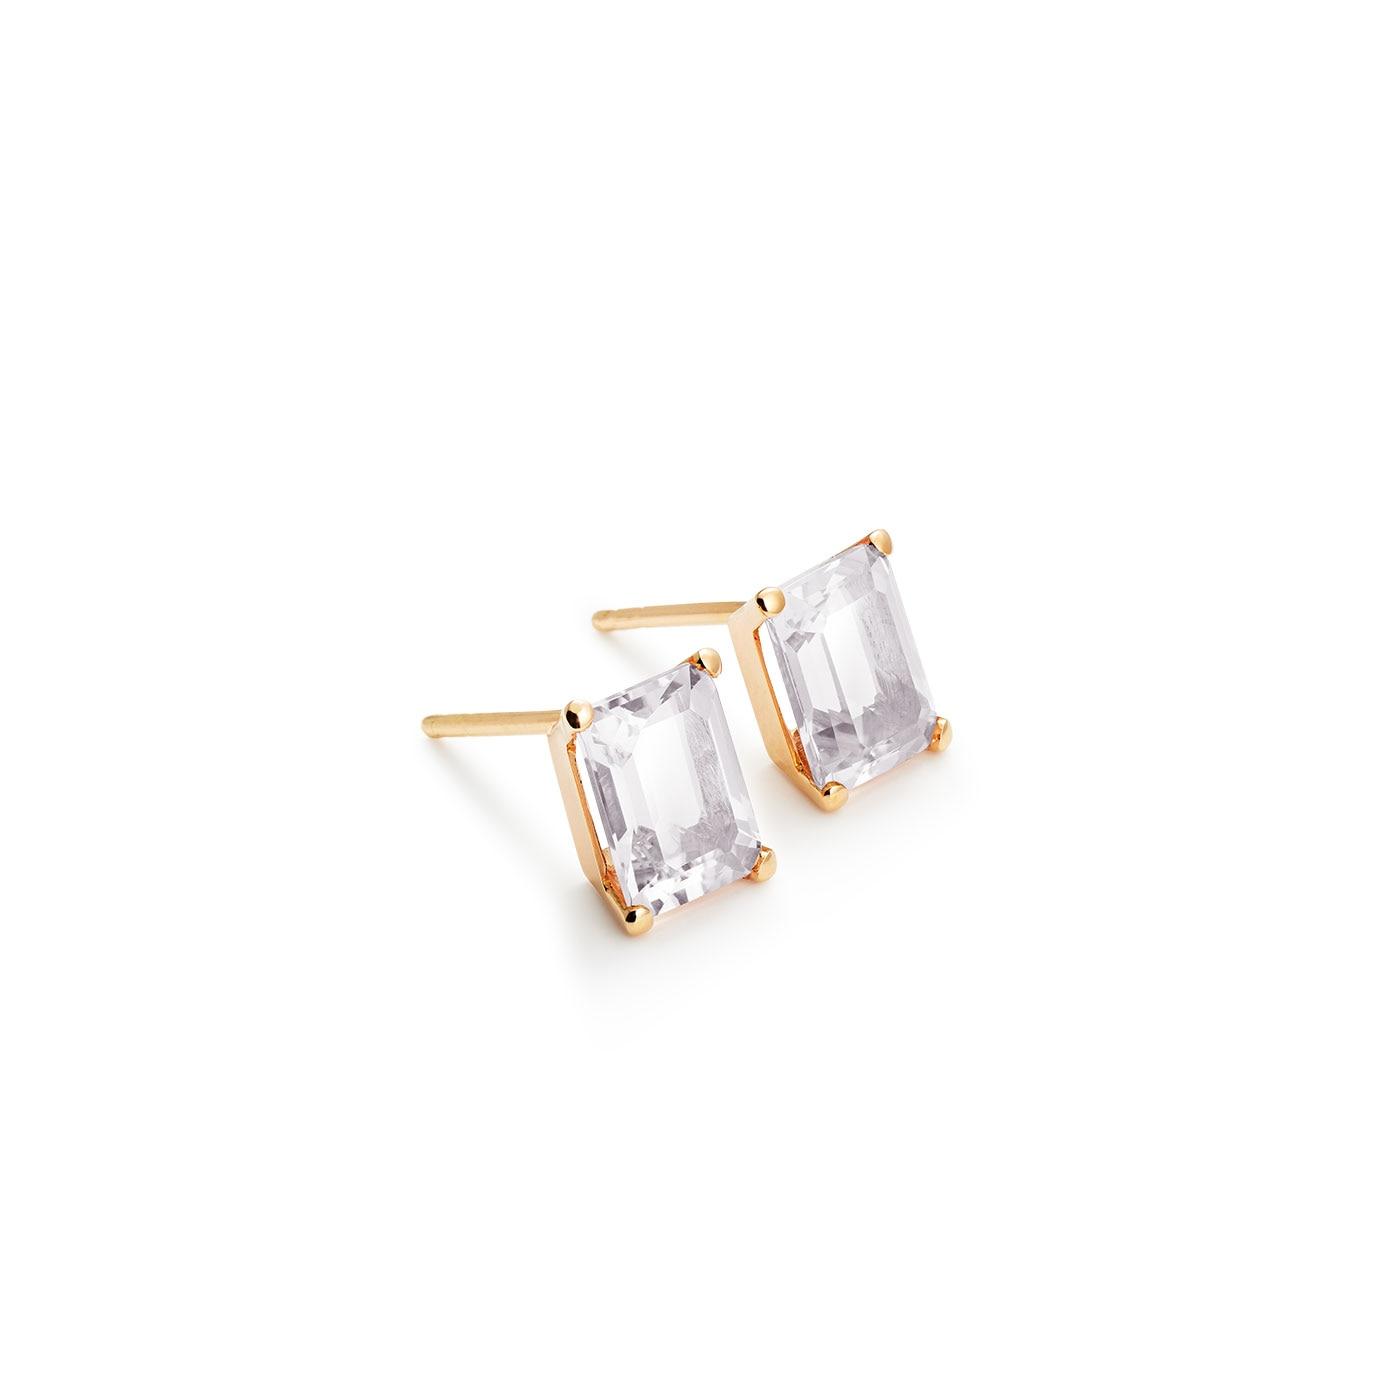 Pixie örhängen 18K bergkristall